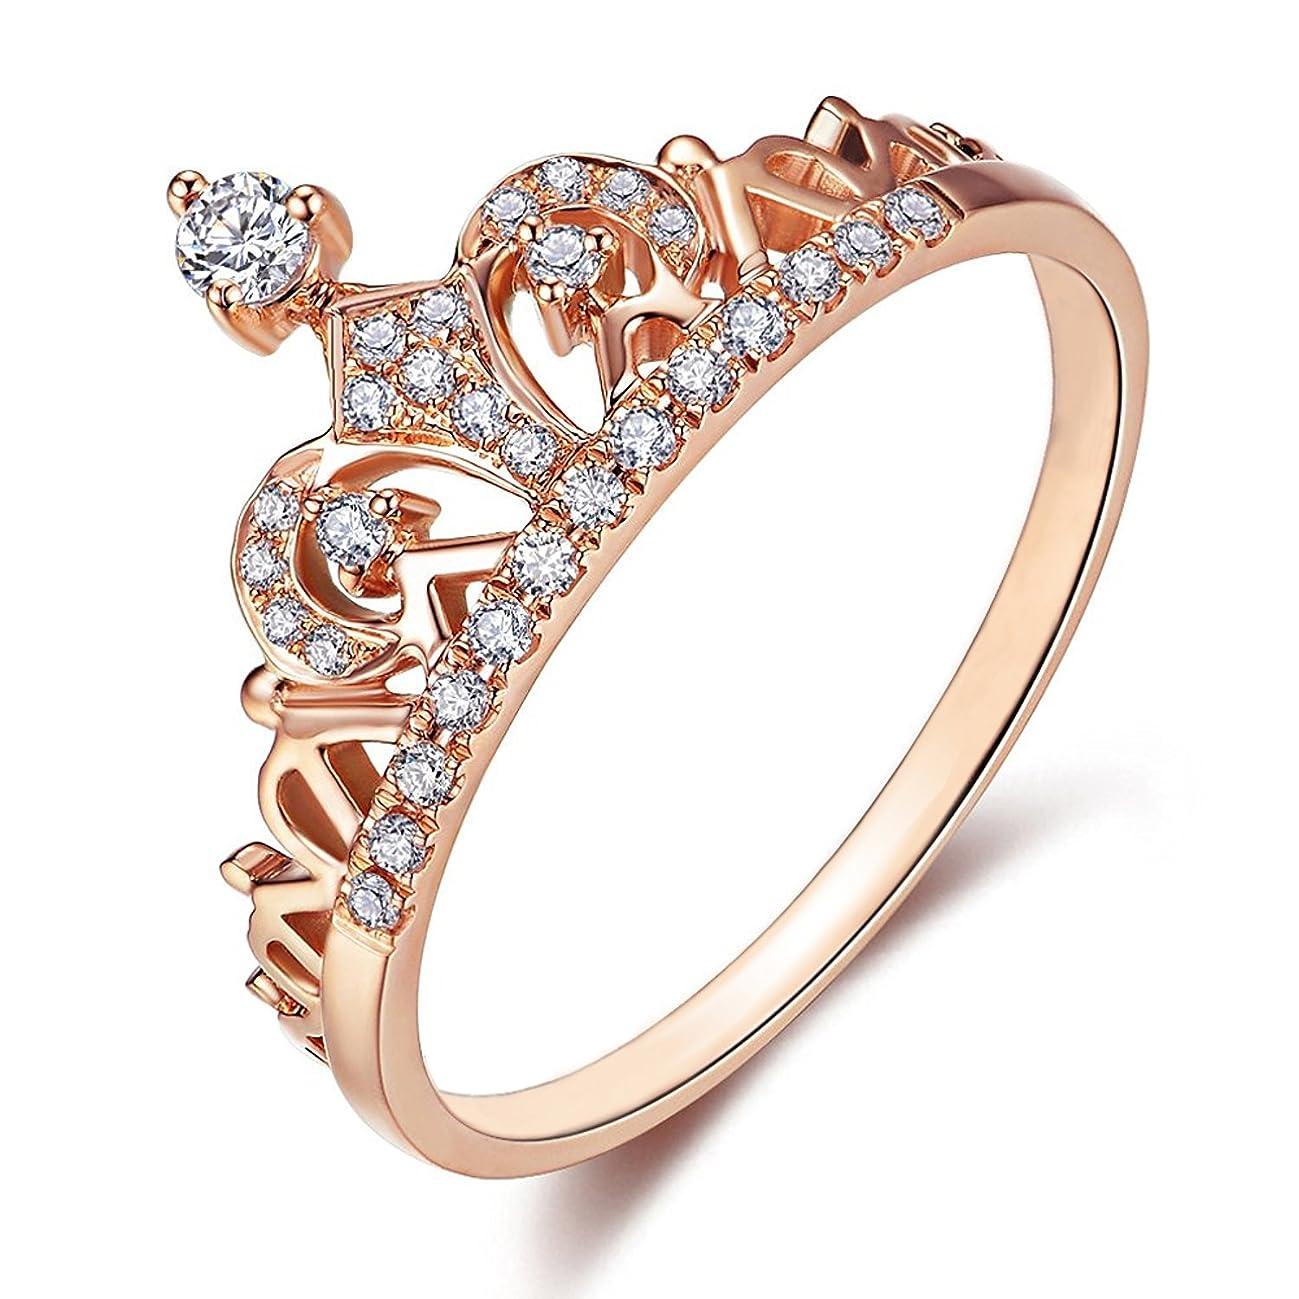 Presentski Women Crown Rings Princess Queen 18K Gold Plated Tiara Ring Tiny CZ Gift Girl Promise Ring